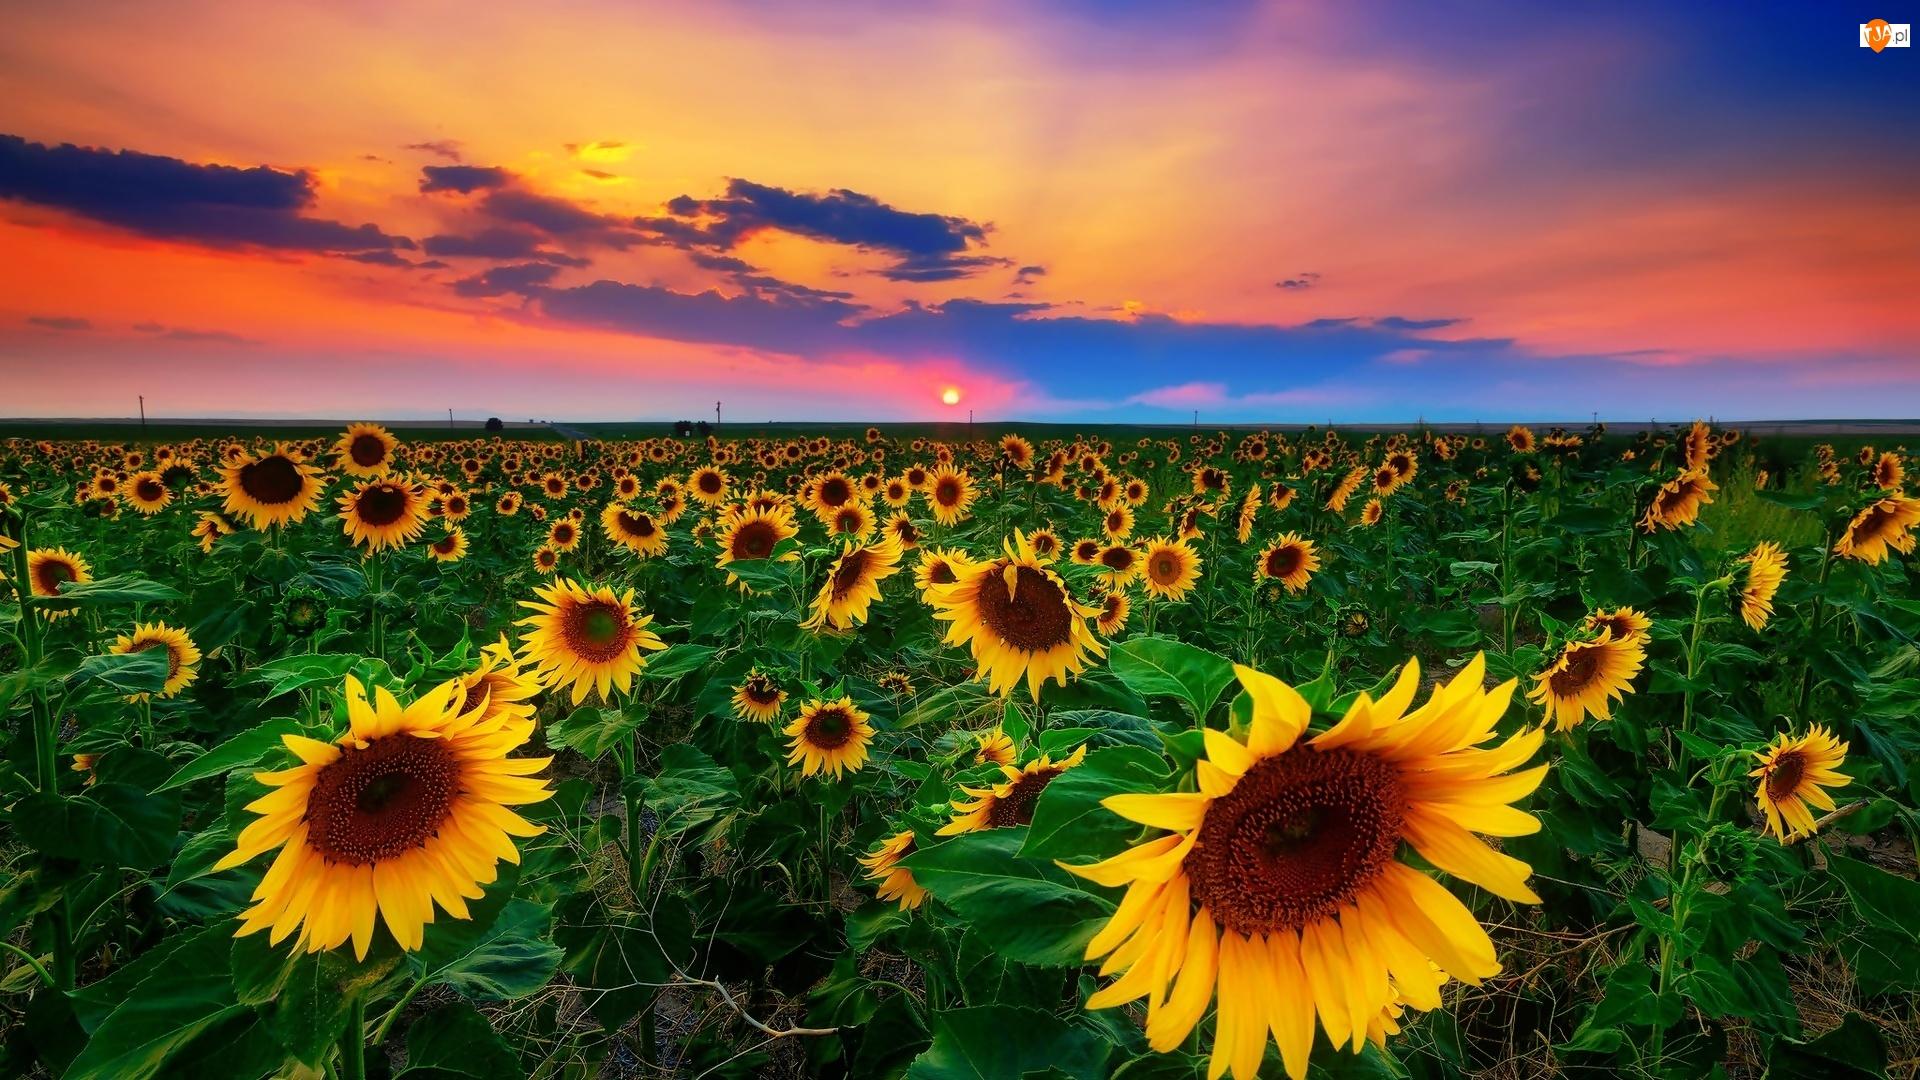 Słońca, Pole, Piękny, Słoneczniki, Zachód